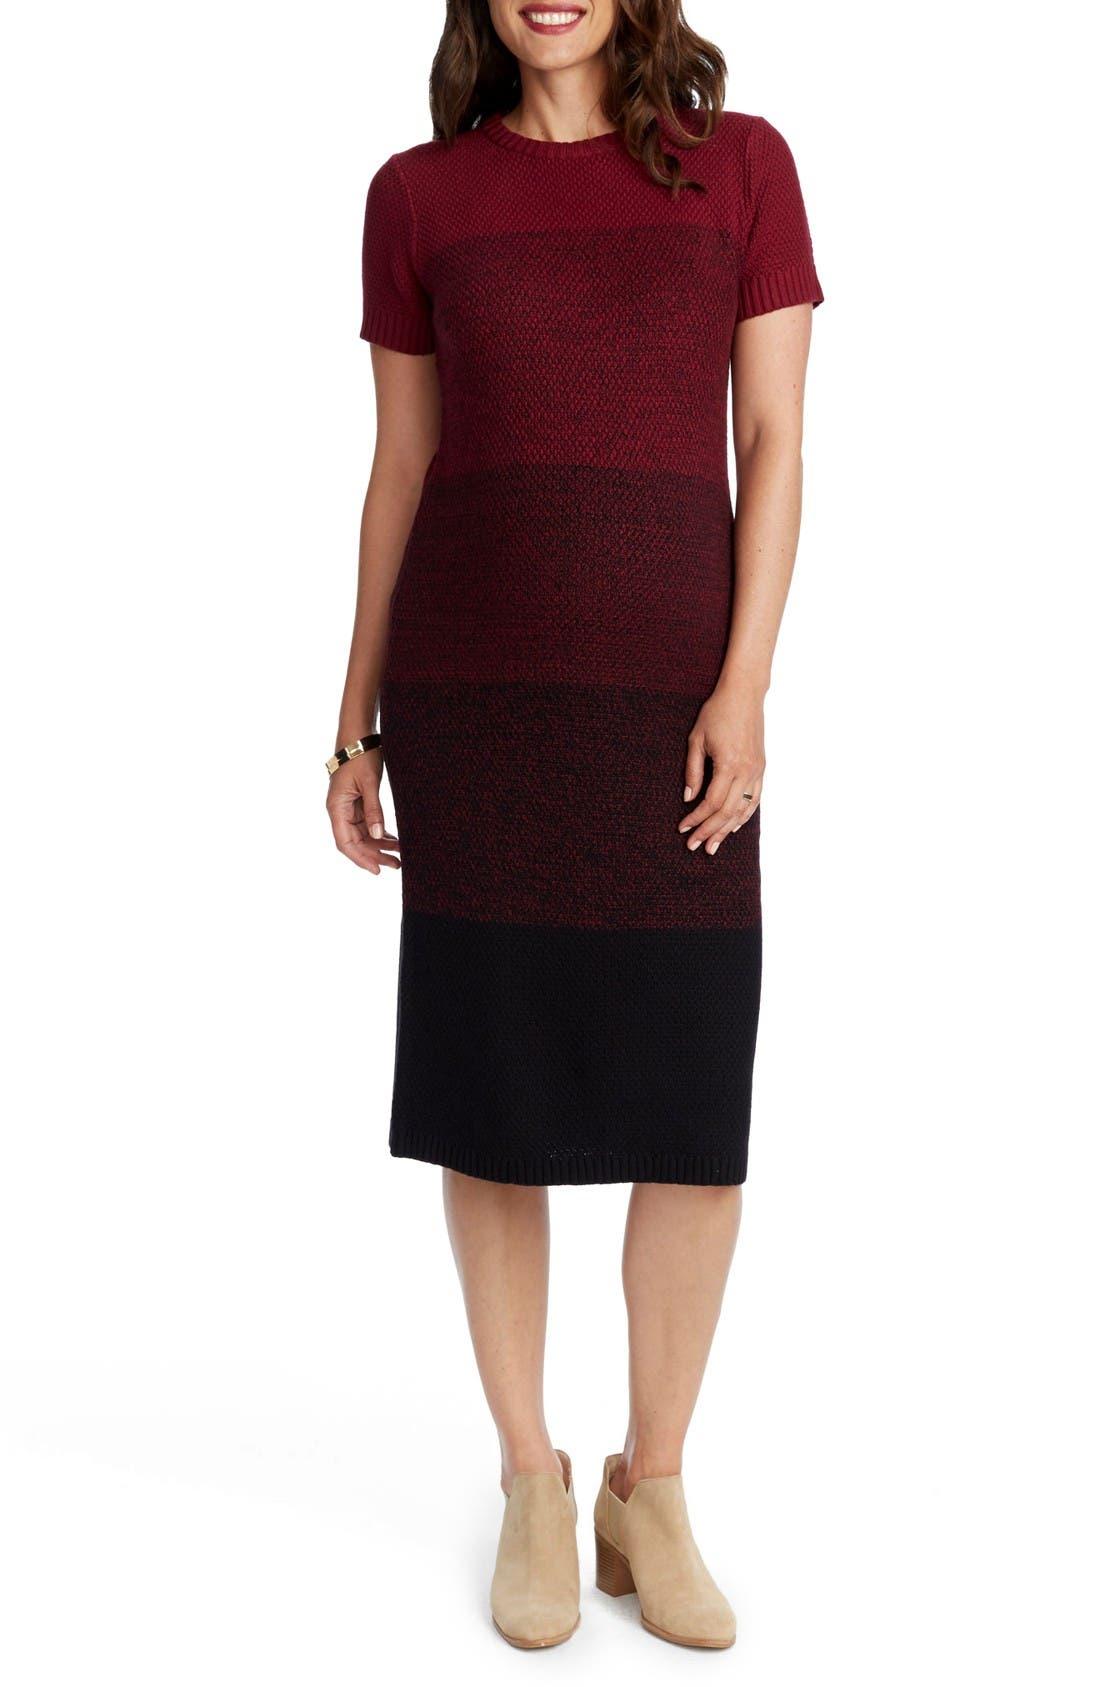 Daisy Ombré Maternity T-Shirt Dress,                             Main thumbnail 1, color,                             Burgundy Ombre